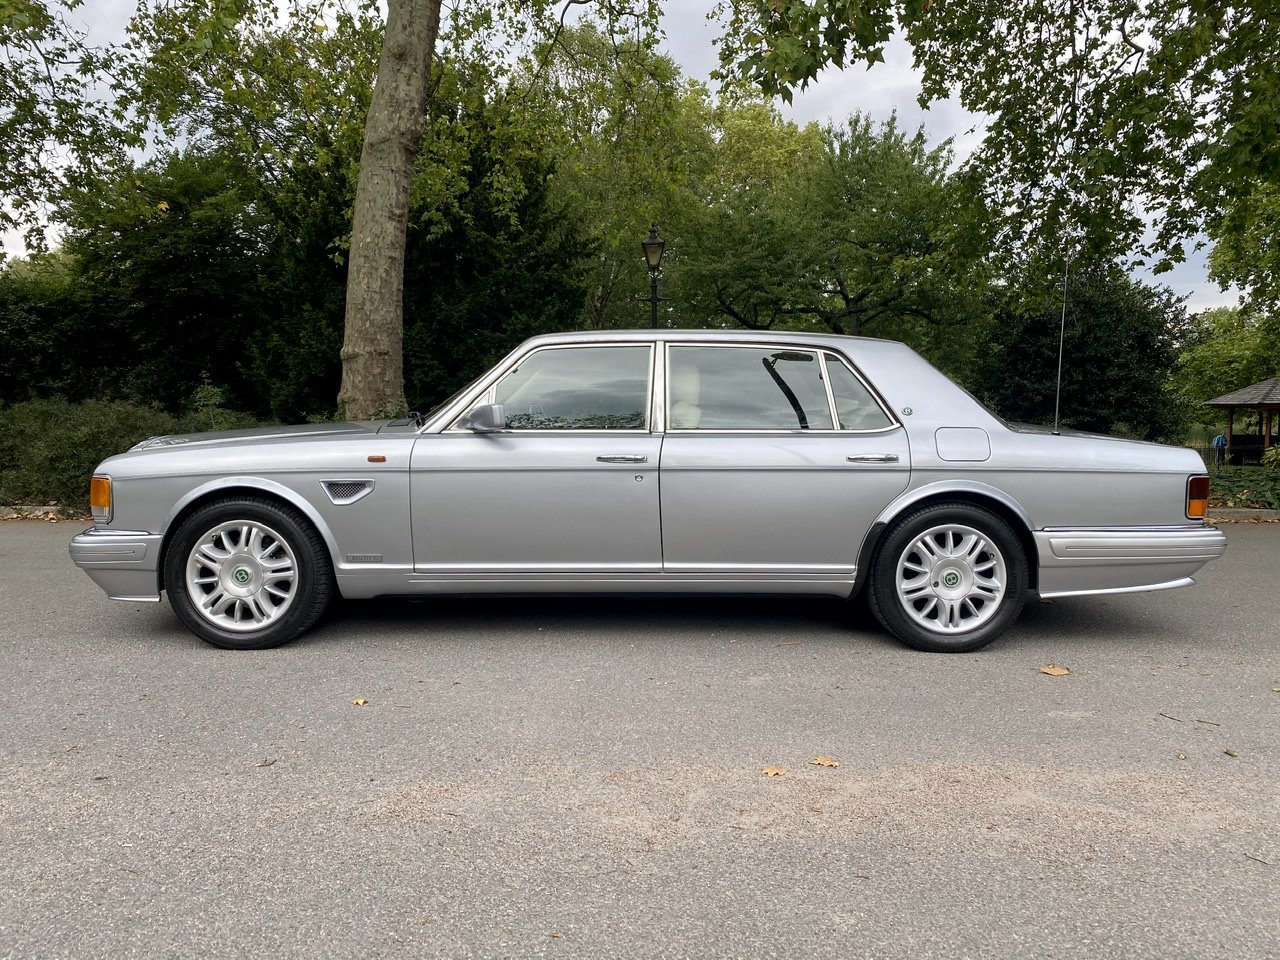 1998 Bentley Brooklands 'R' Mulliner For Sale (picture 5 of 22)